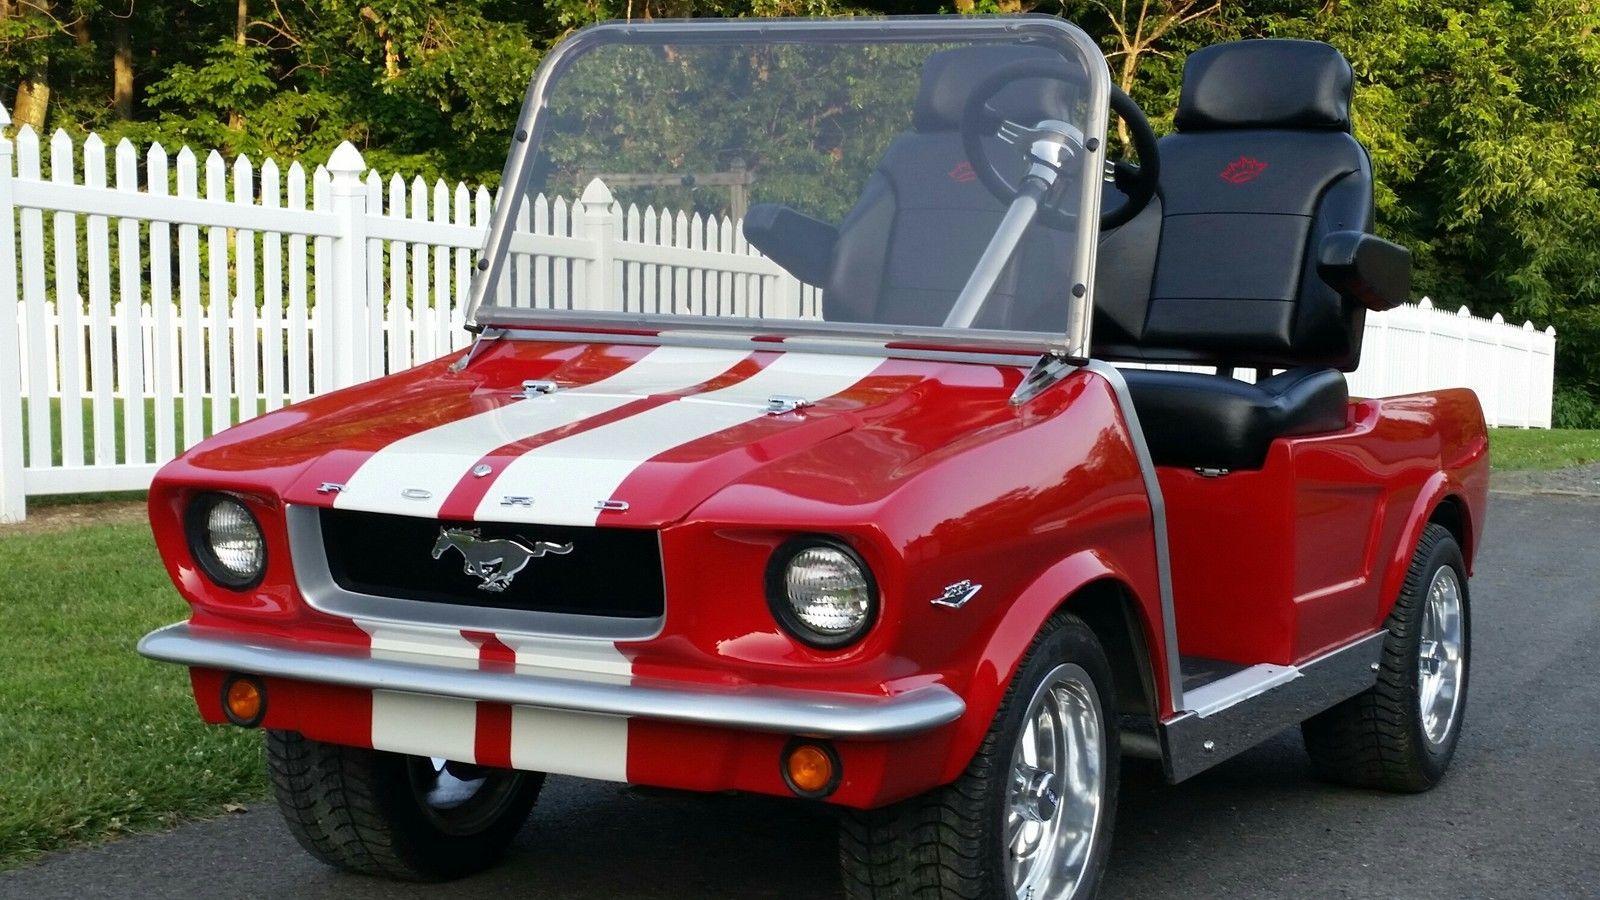 used for bg sale more carts golf custom bentley cart